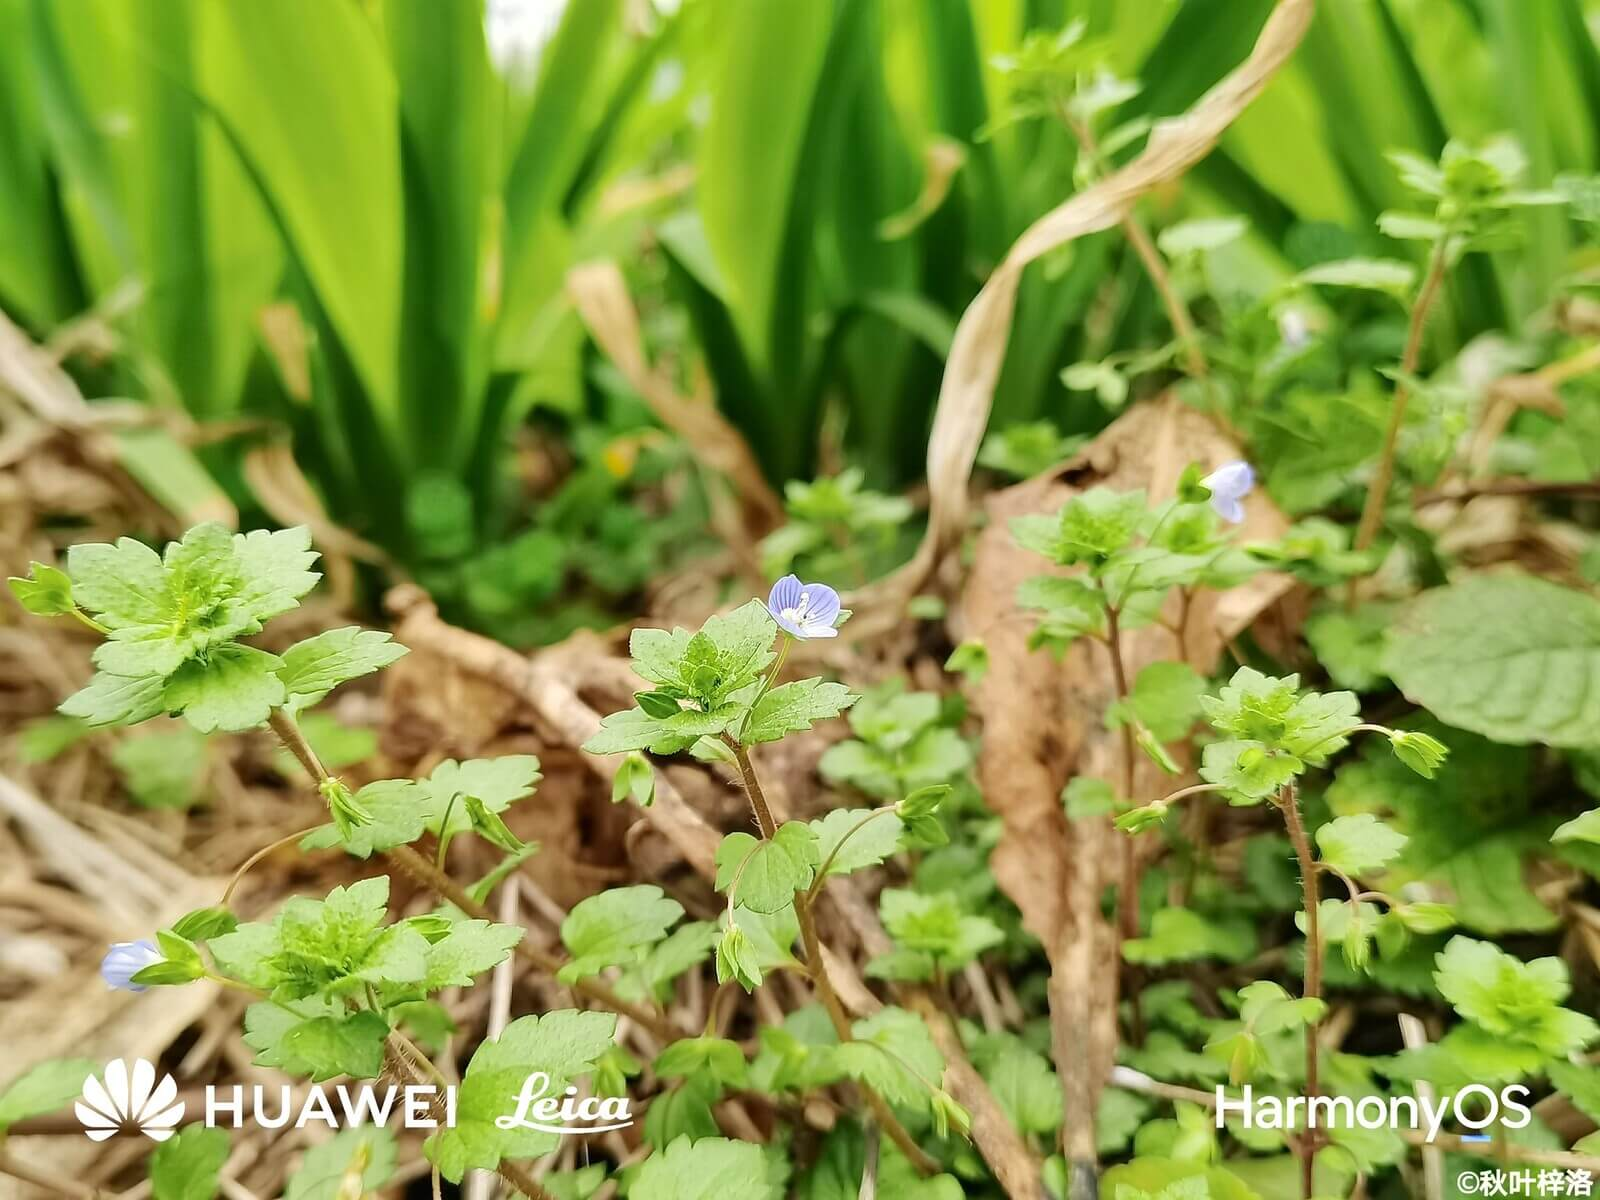 Huawei P50 Photo Samples